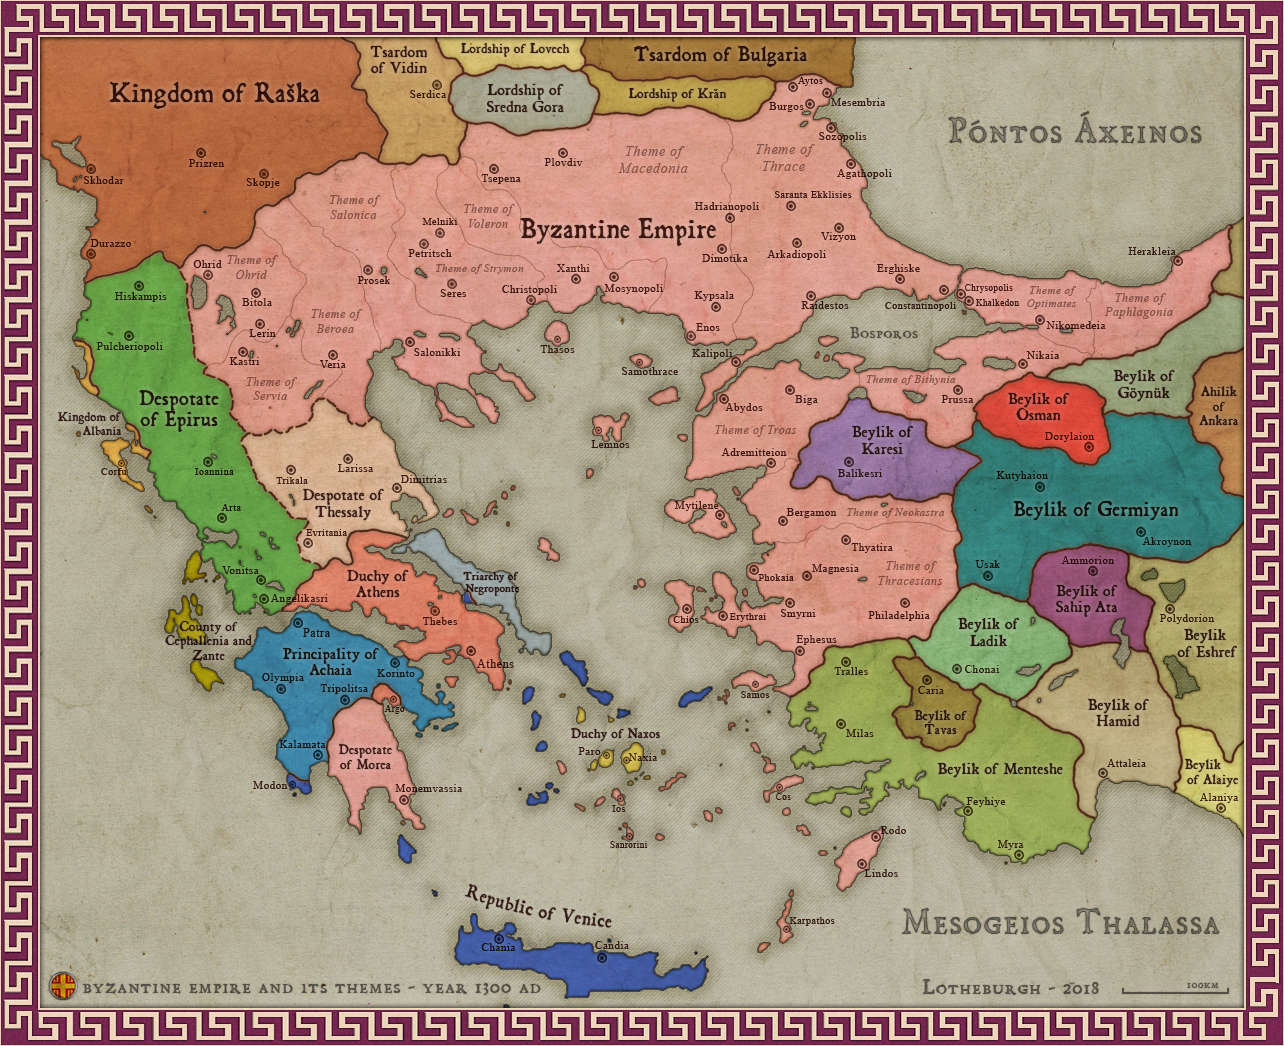 byzantine_empire_and_its_themes___ad_1300_by_thegreystallion_dbs2jdk